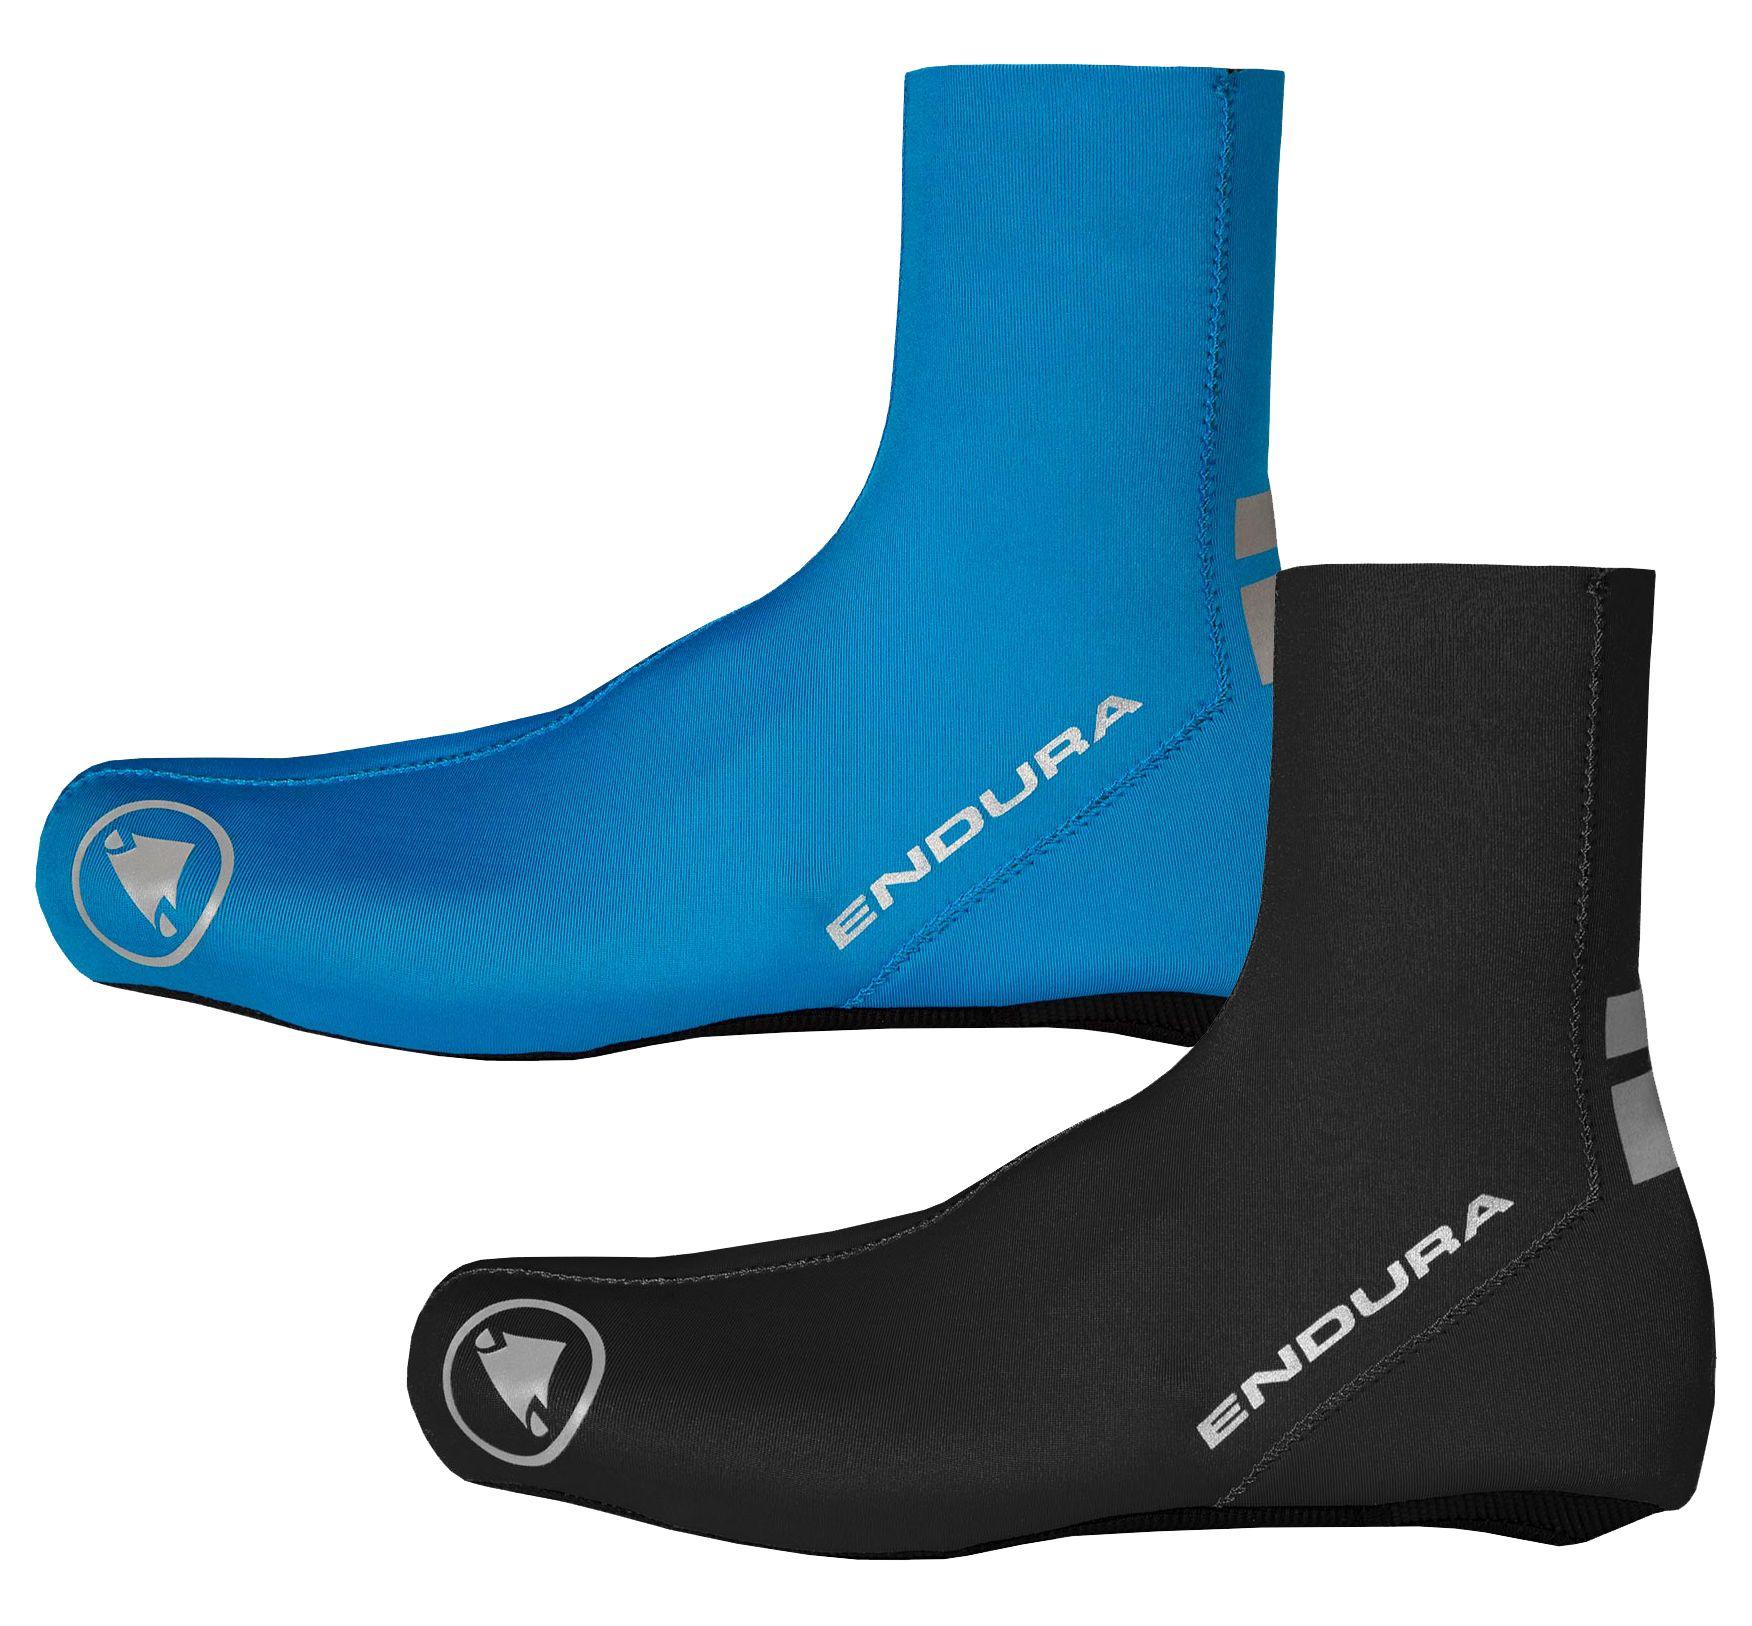 Endura Fs260-pro Nemo Overshoes 2020 | shoecovers_clothes